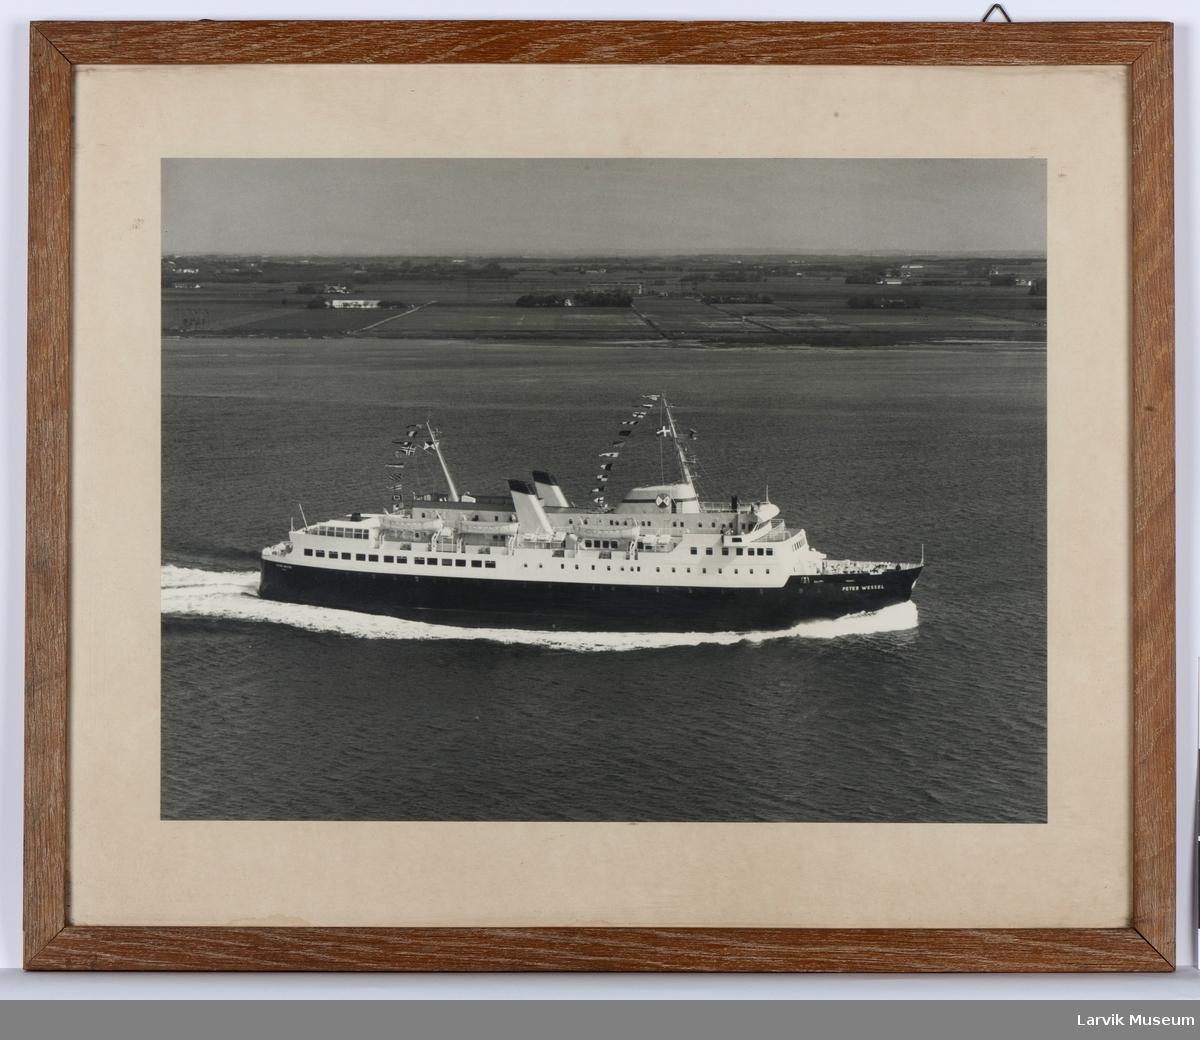 MS Peter Wessel (nr. 2) - Larvik Line